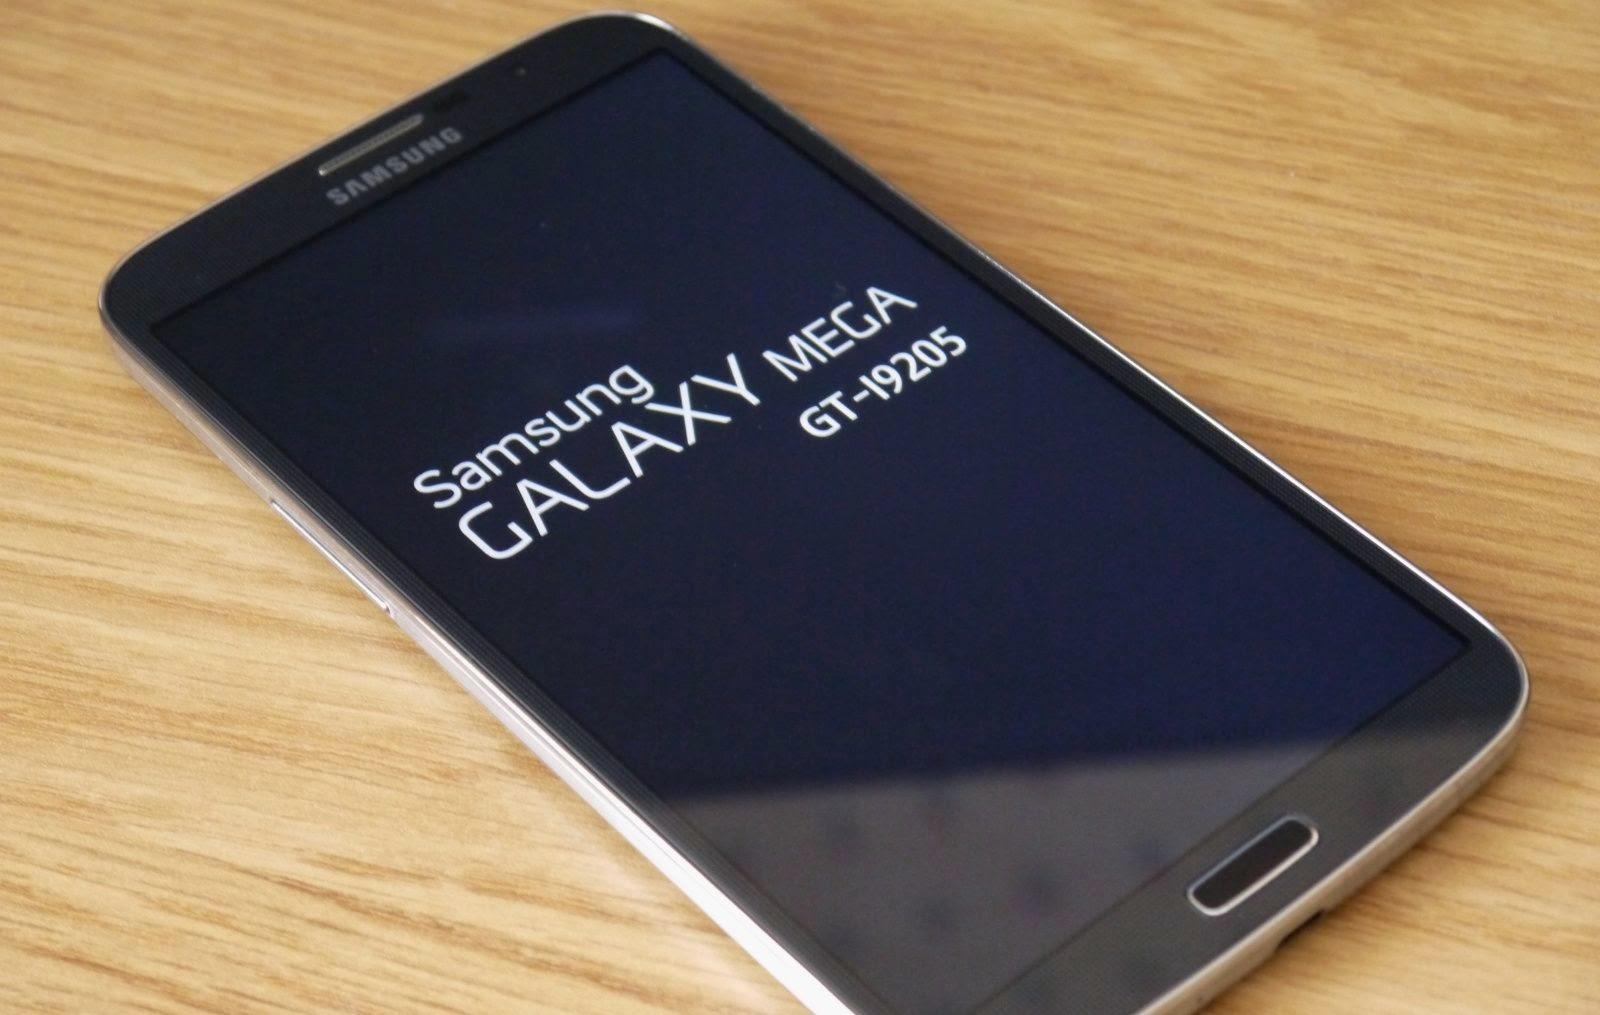 Samsung Galaxy Mega 2 Leak, Samsung Galaxy mega 2, Price of galaxy Mega 2, features of Mega 2